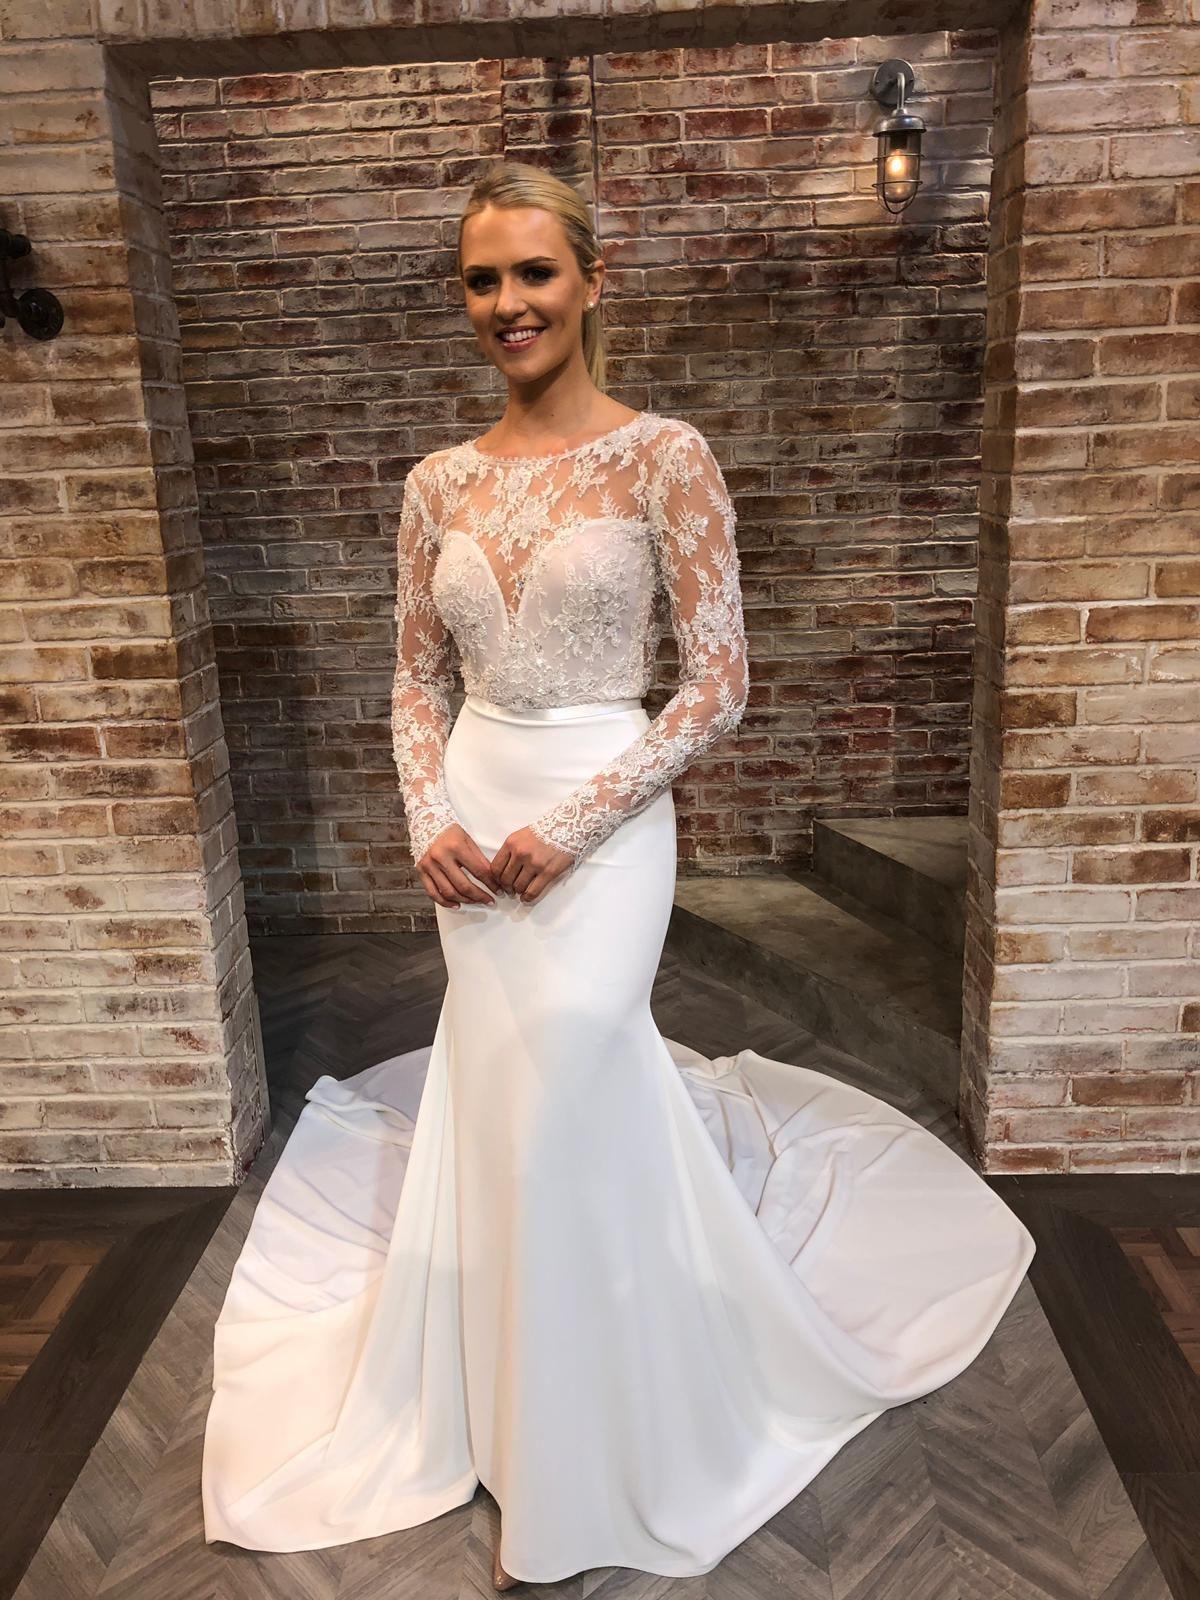 Ireland AM Wedding dresses, Mermaid wedding dress, Dresses